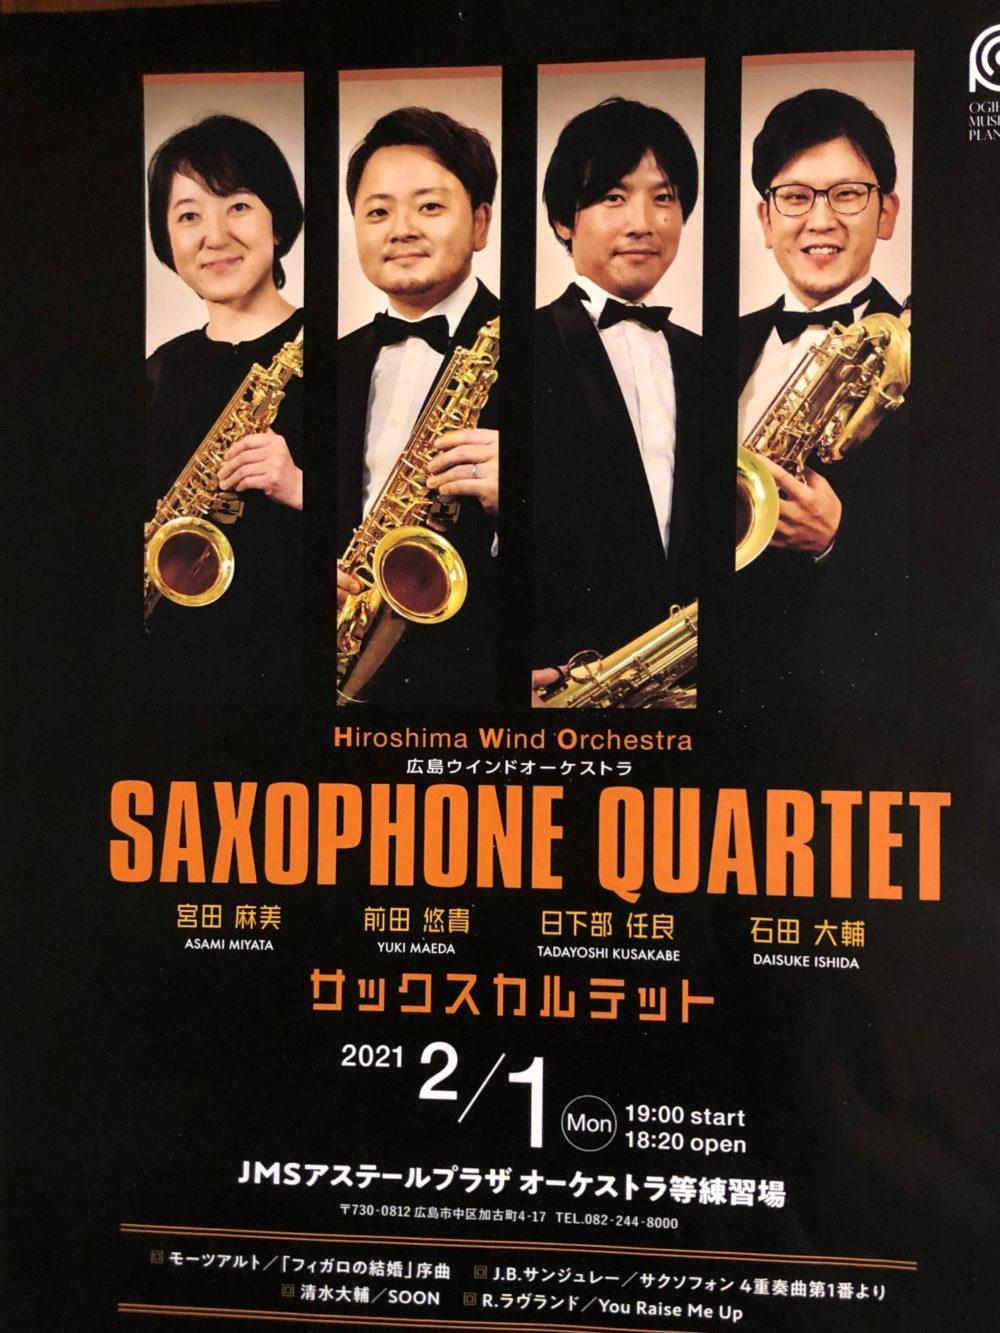 SAXOPHONE QUARTET / 広島アステールプラザ